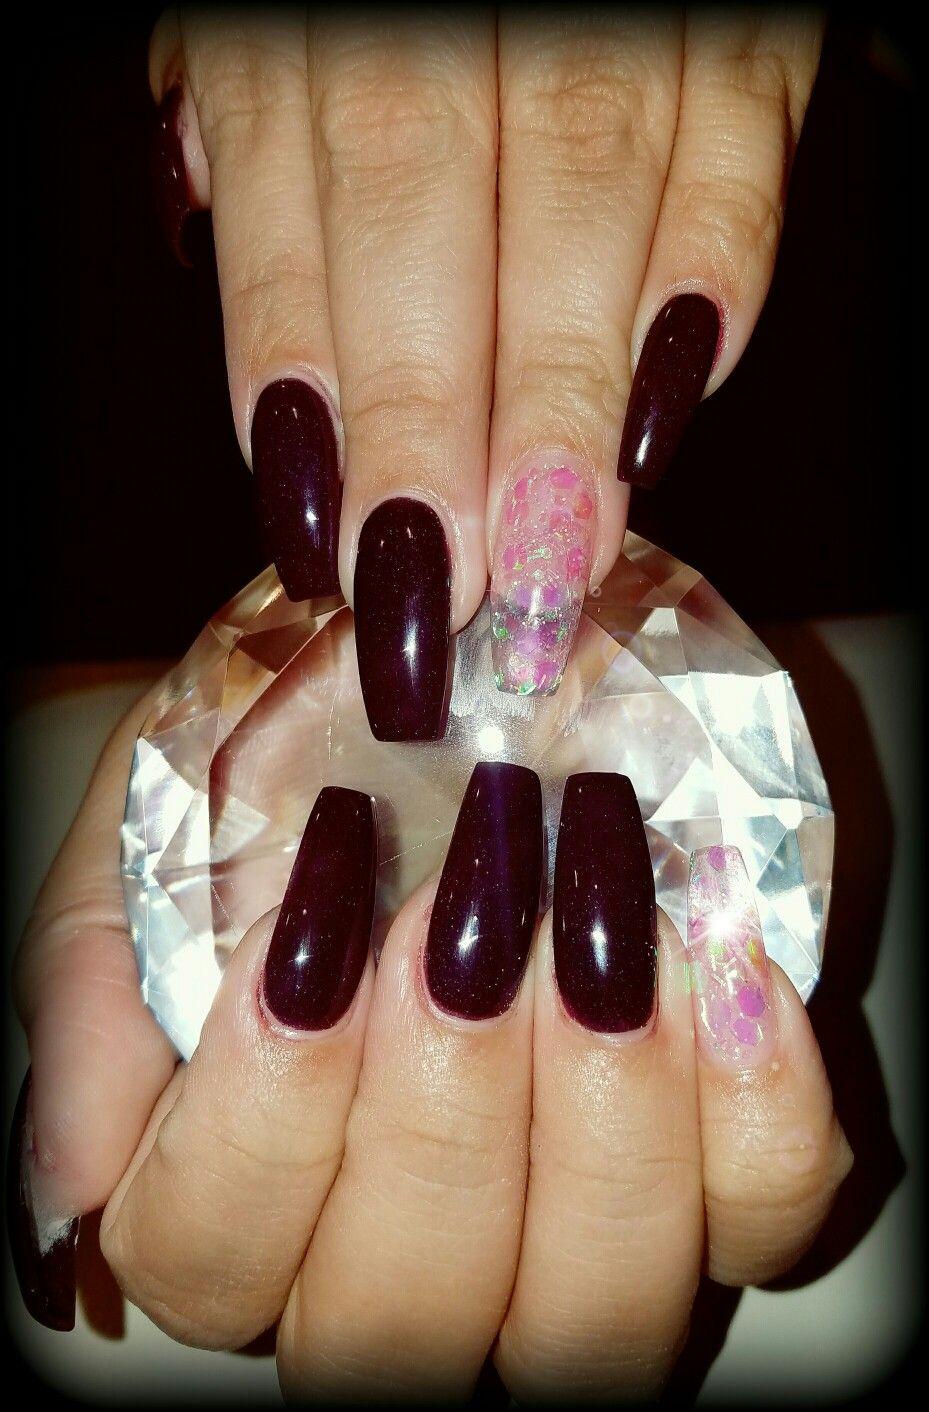 Plum coffin nails | Flirtatious Nails | Pinterest | Coffin nails